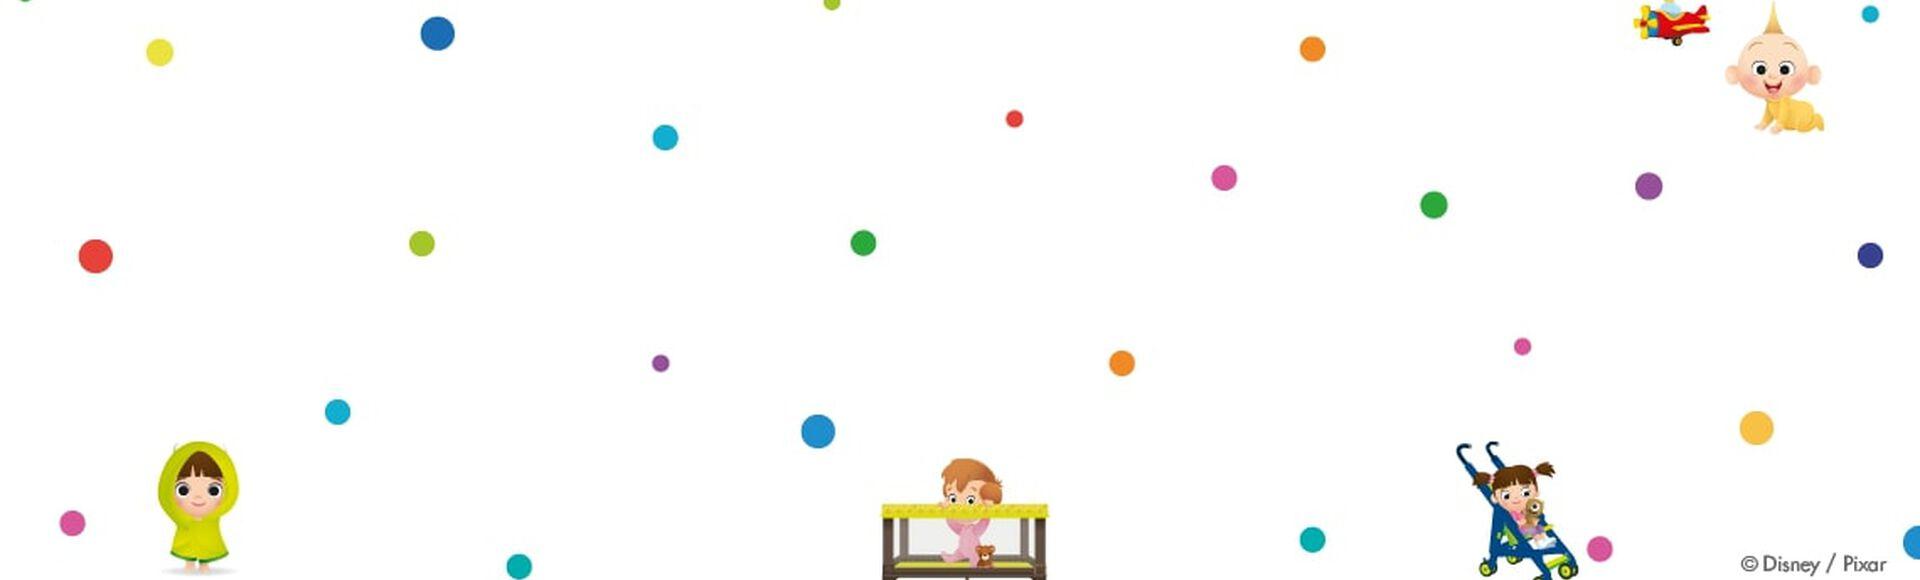 O micromundo do bebê